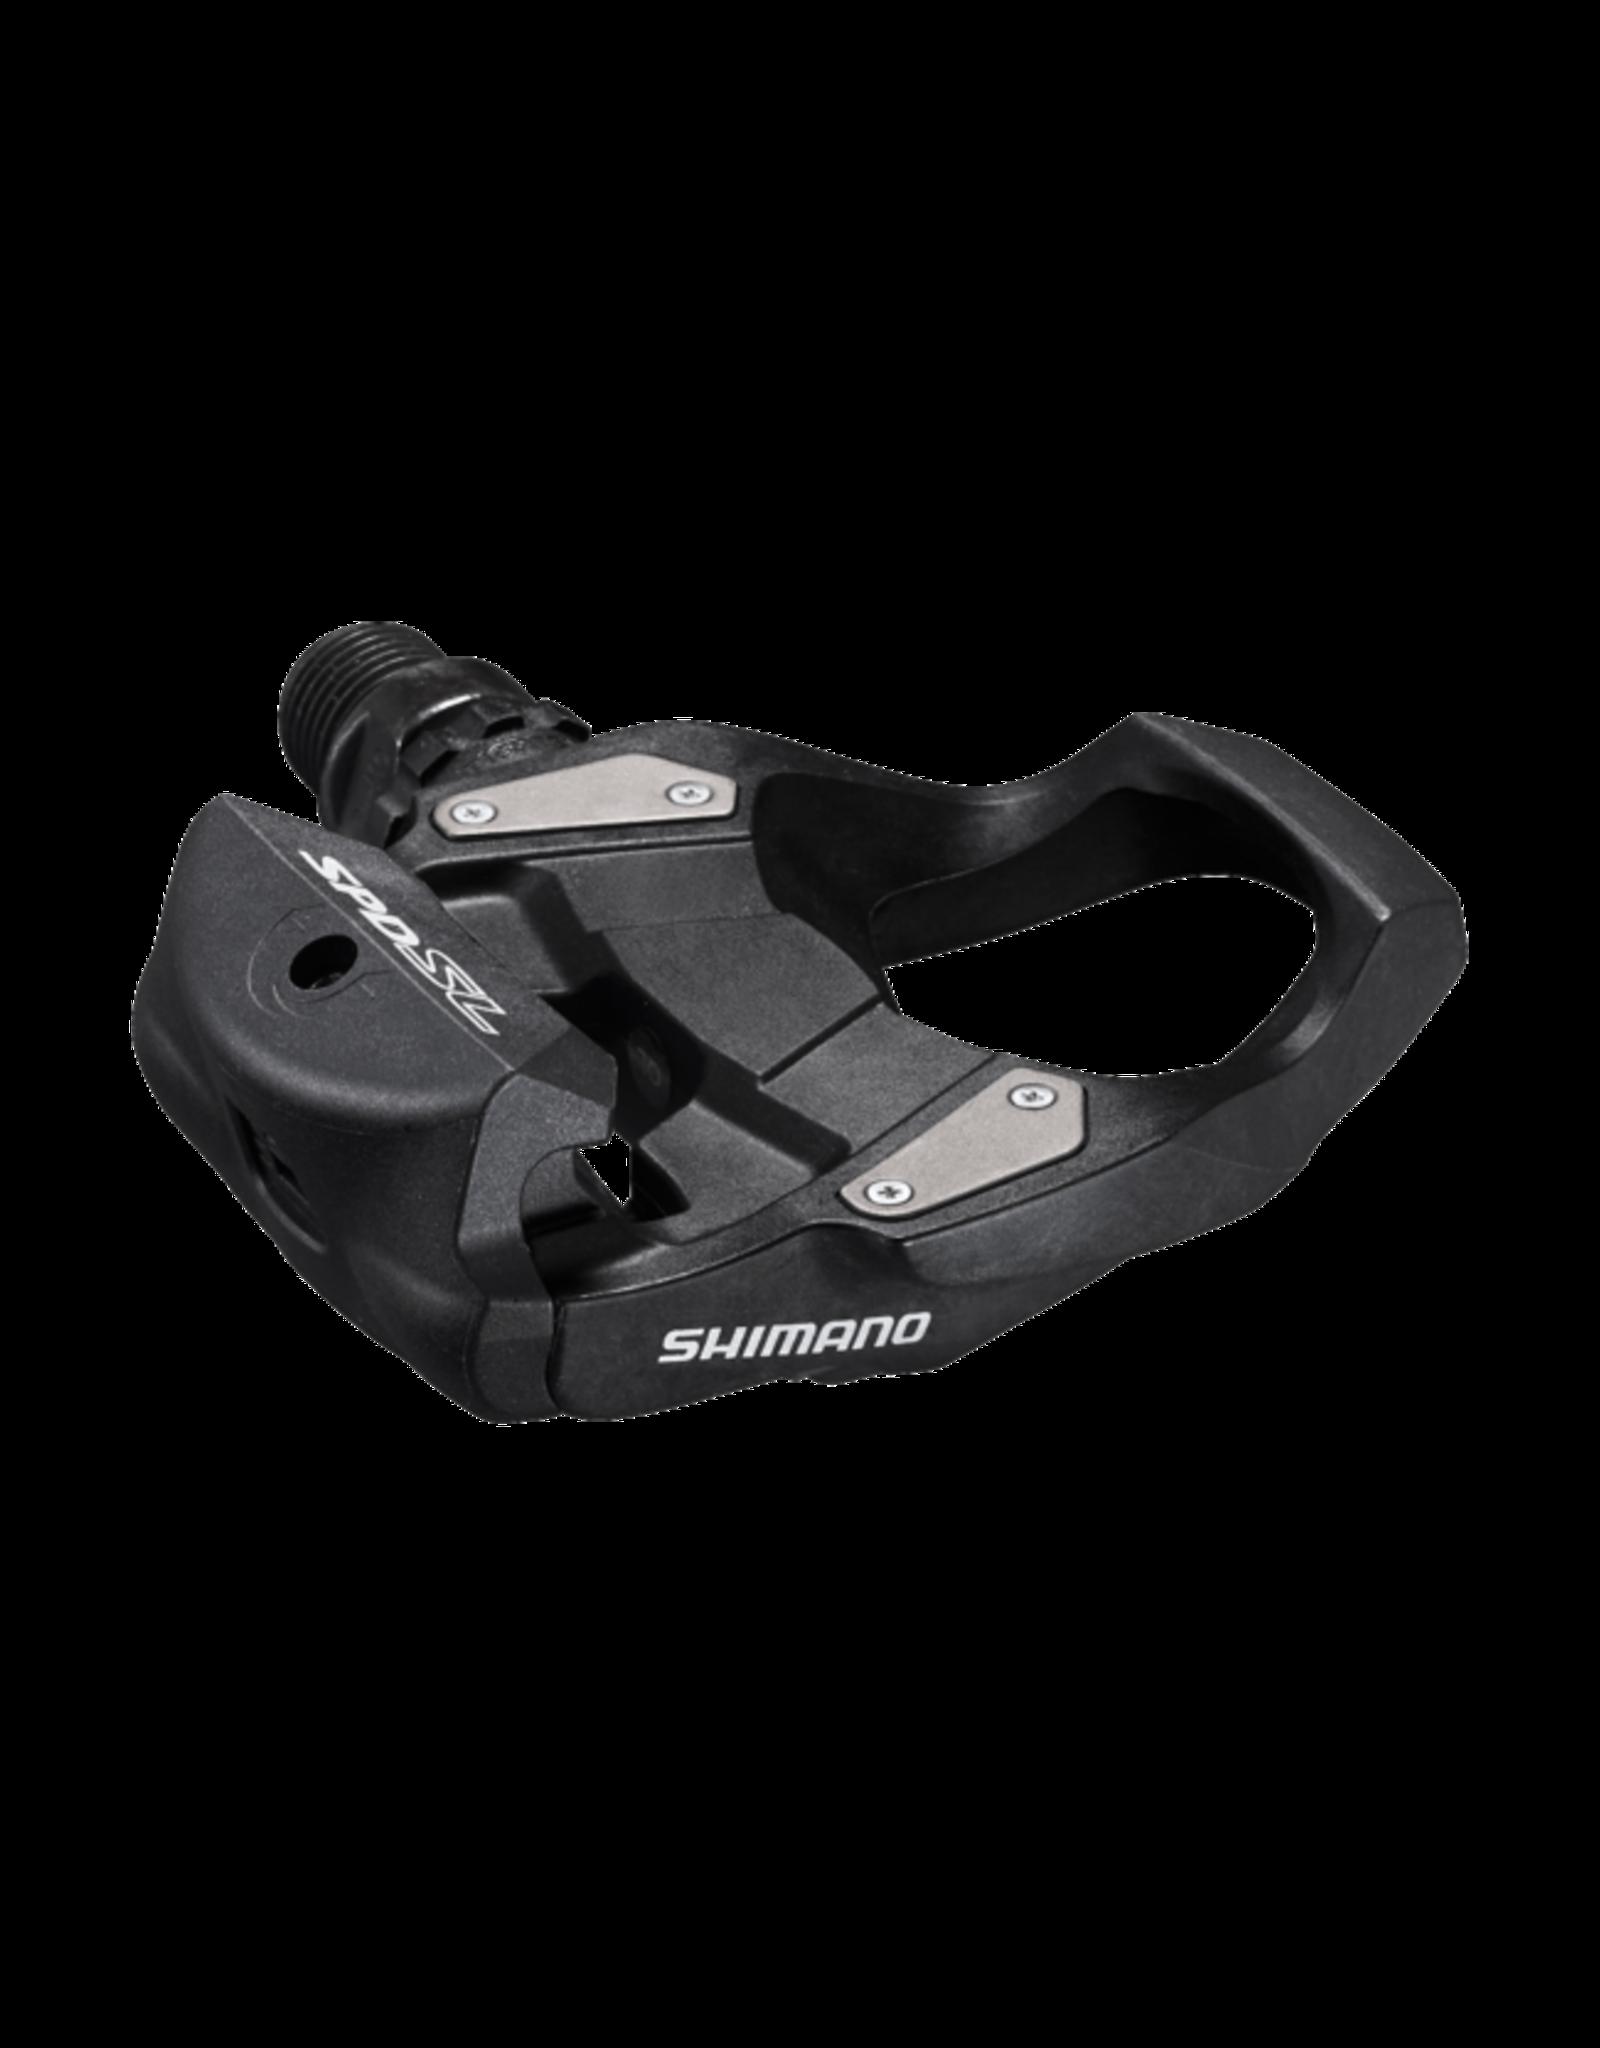 Shimano Shimano RS500 pedals (SH-11 cleats) black